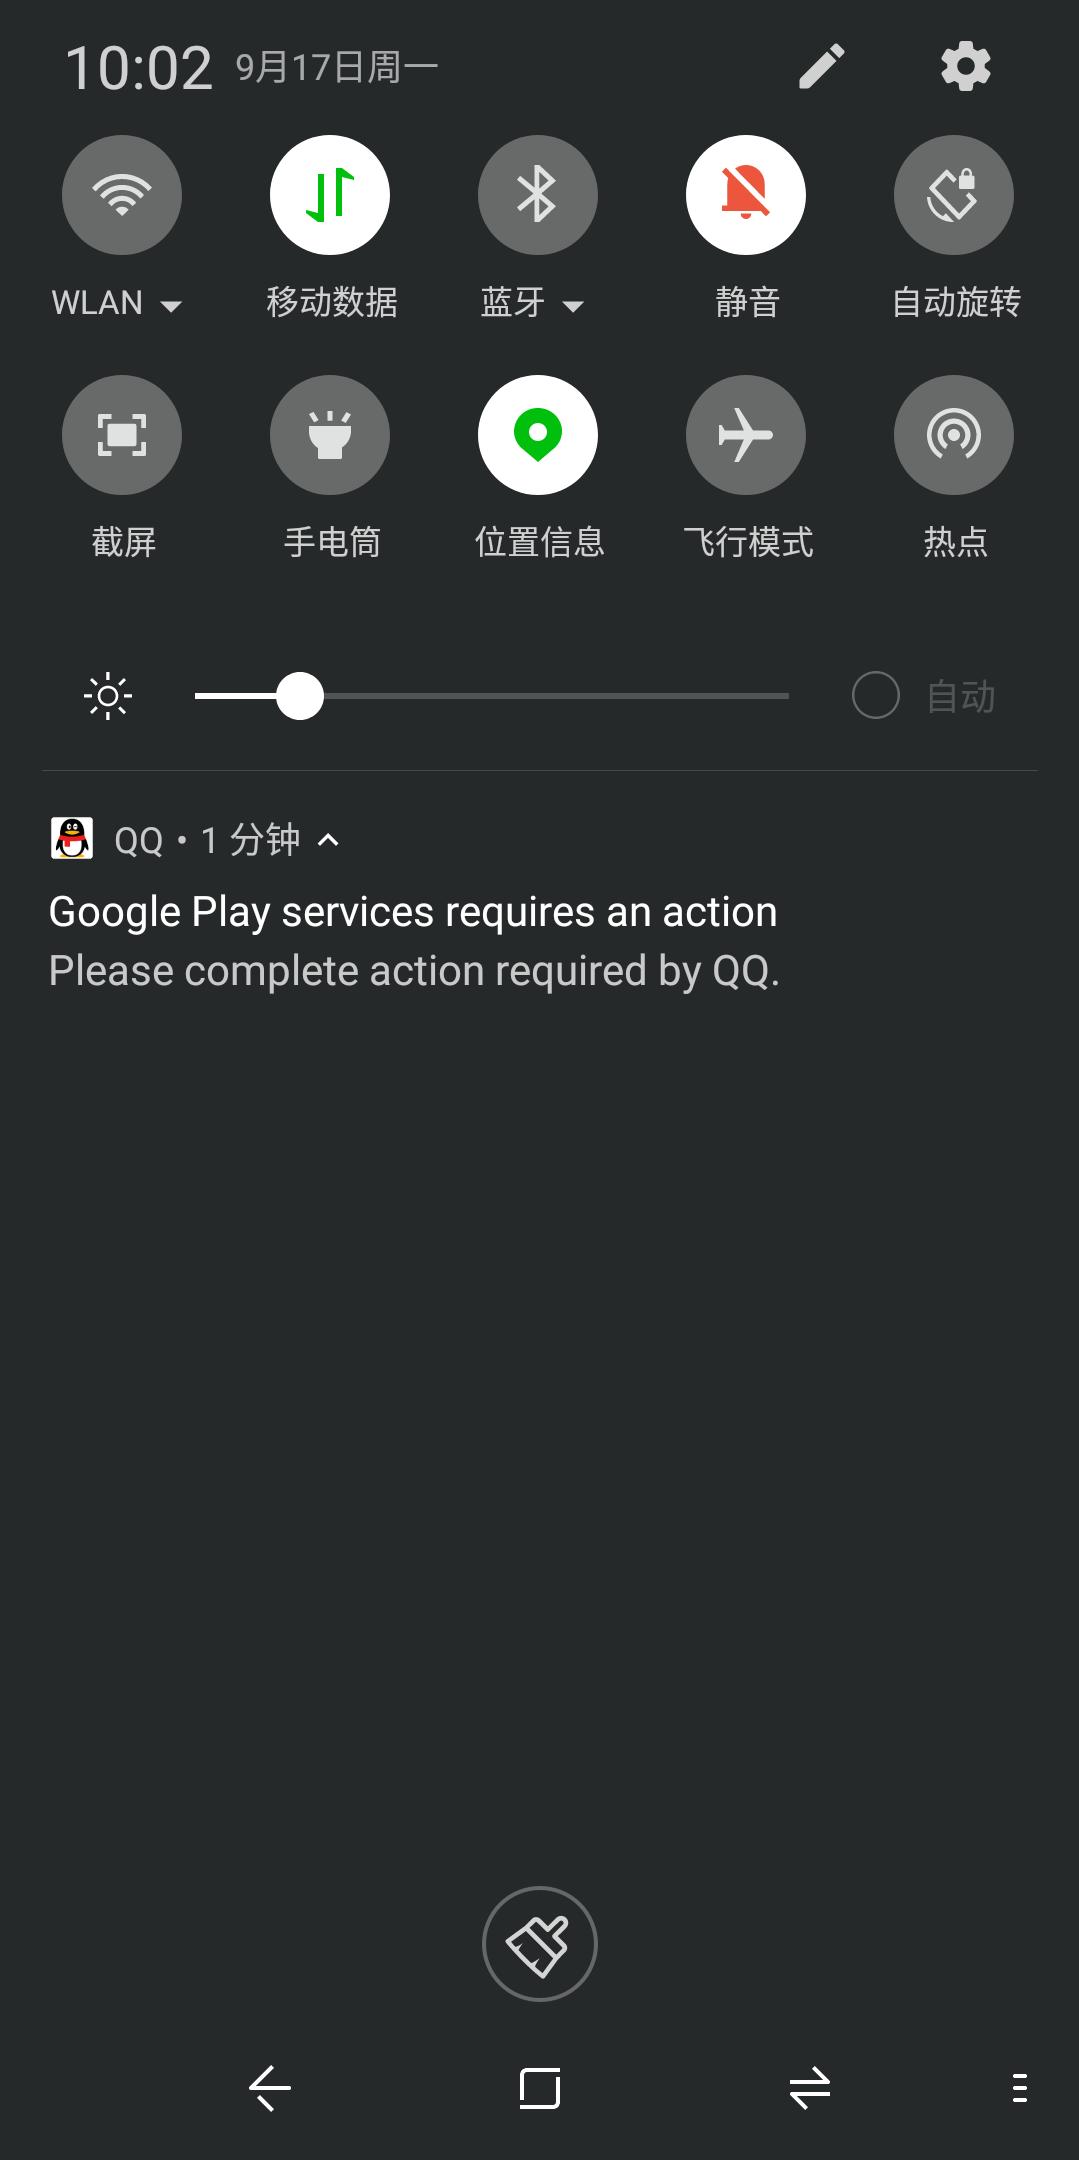 Screenshot_2018-09-17-10-02-19.png